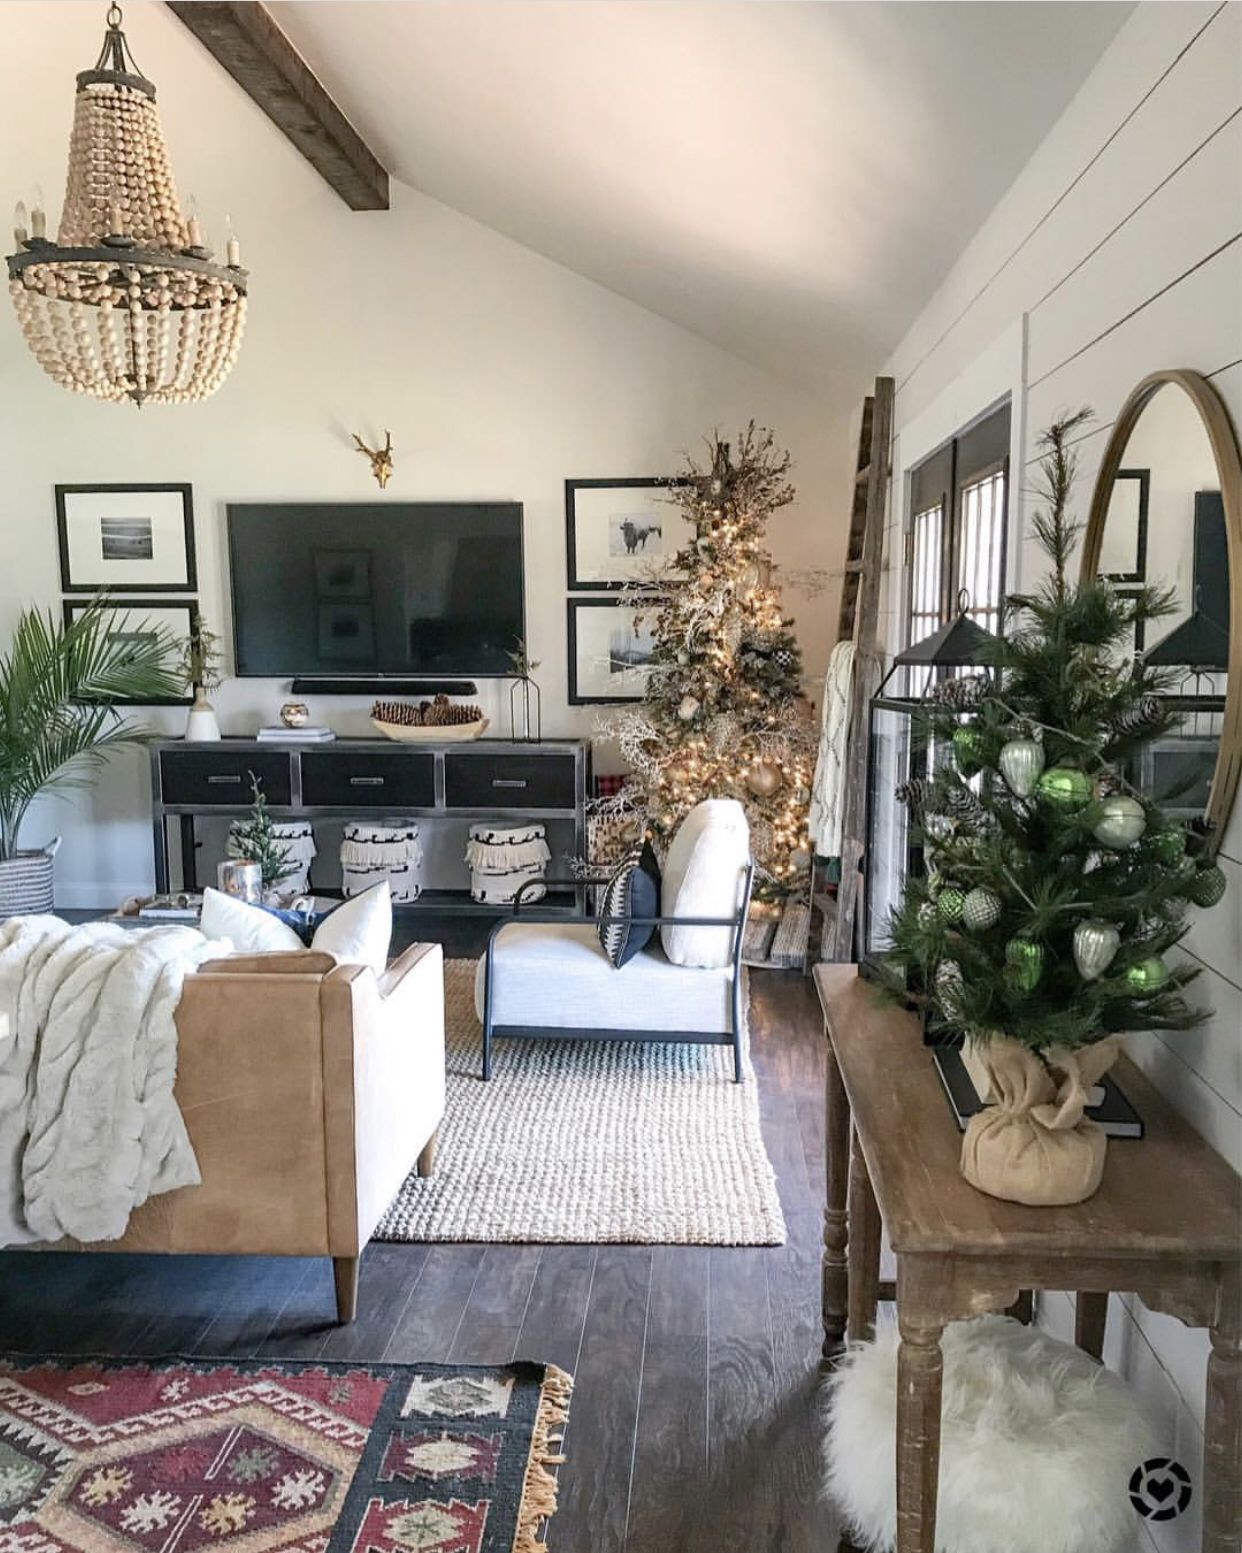 How I Decorate My Living Room For Christmas Christmas Christmasdecor Christmastree Fa Urban Farmhouse Designs Home Decor Christmas Decorations Living Room